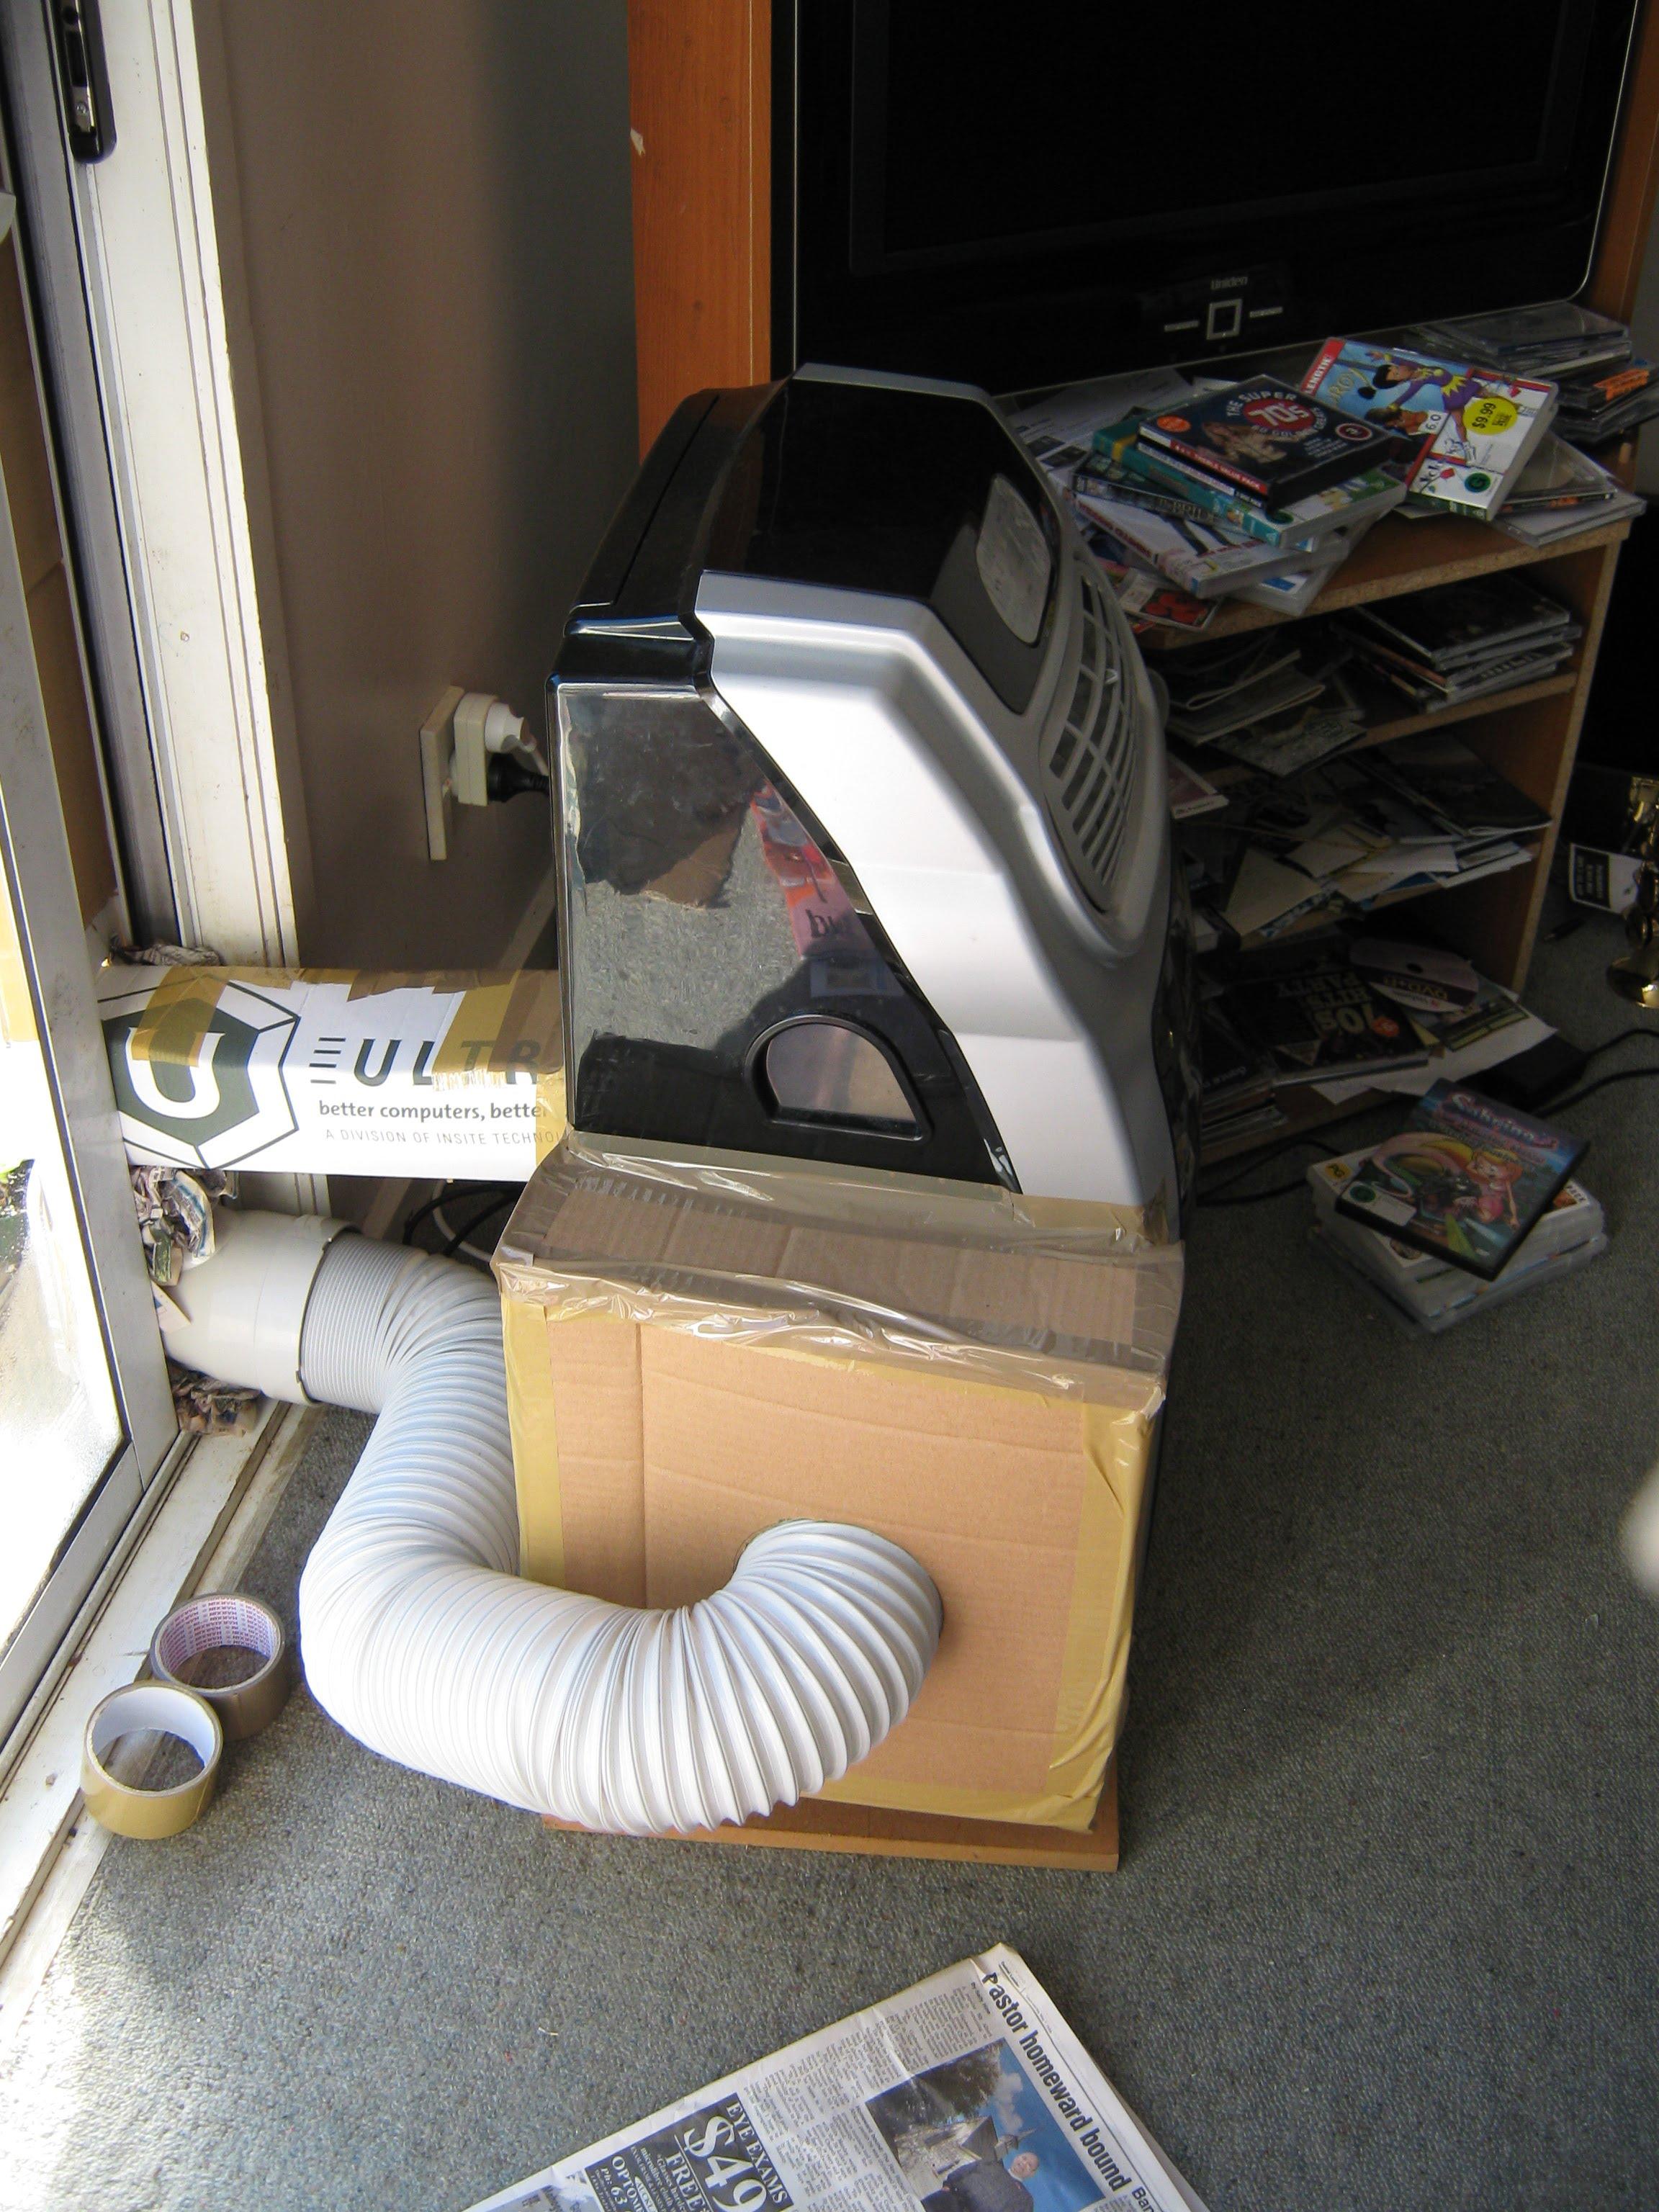 pompes chaleur et ventilation ing nierie des syst mes. Black Bedroom Furniture Sets. Home Design Ideas